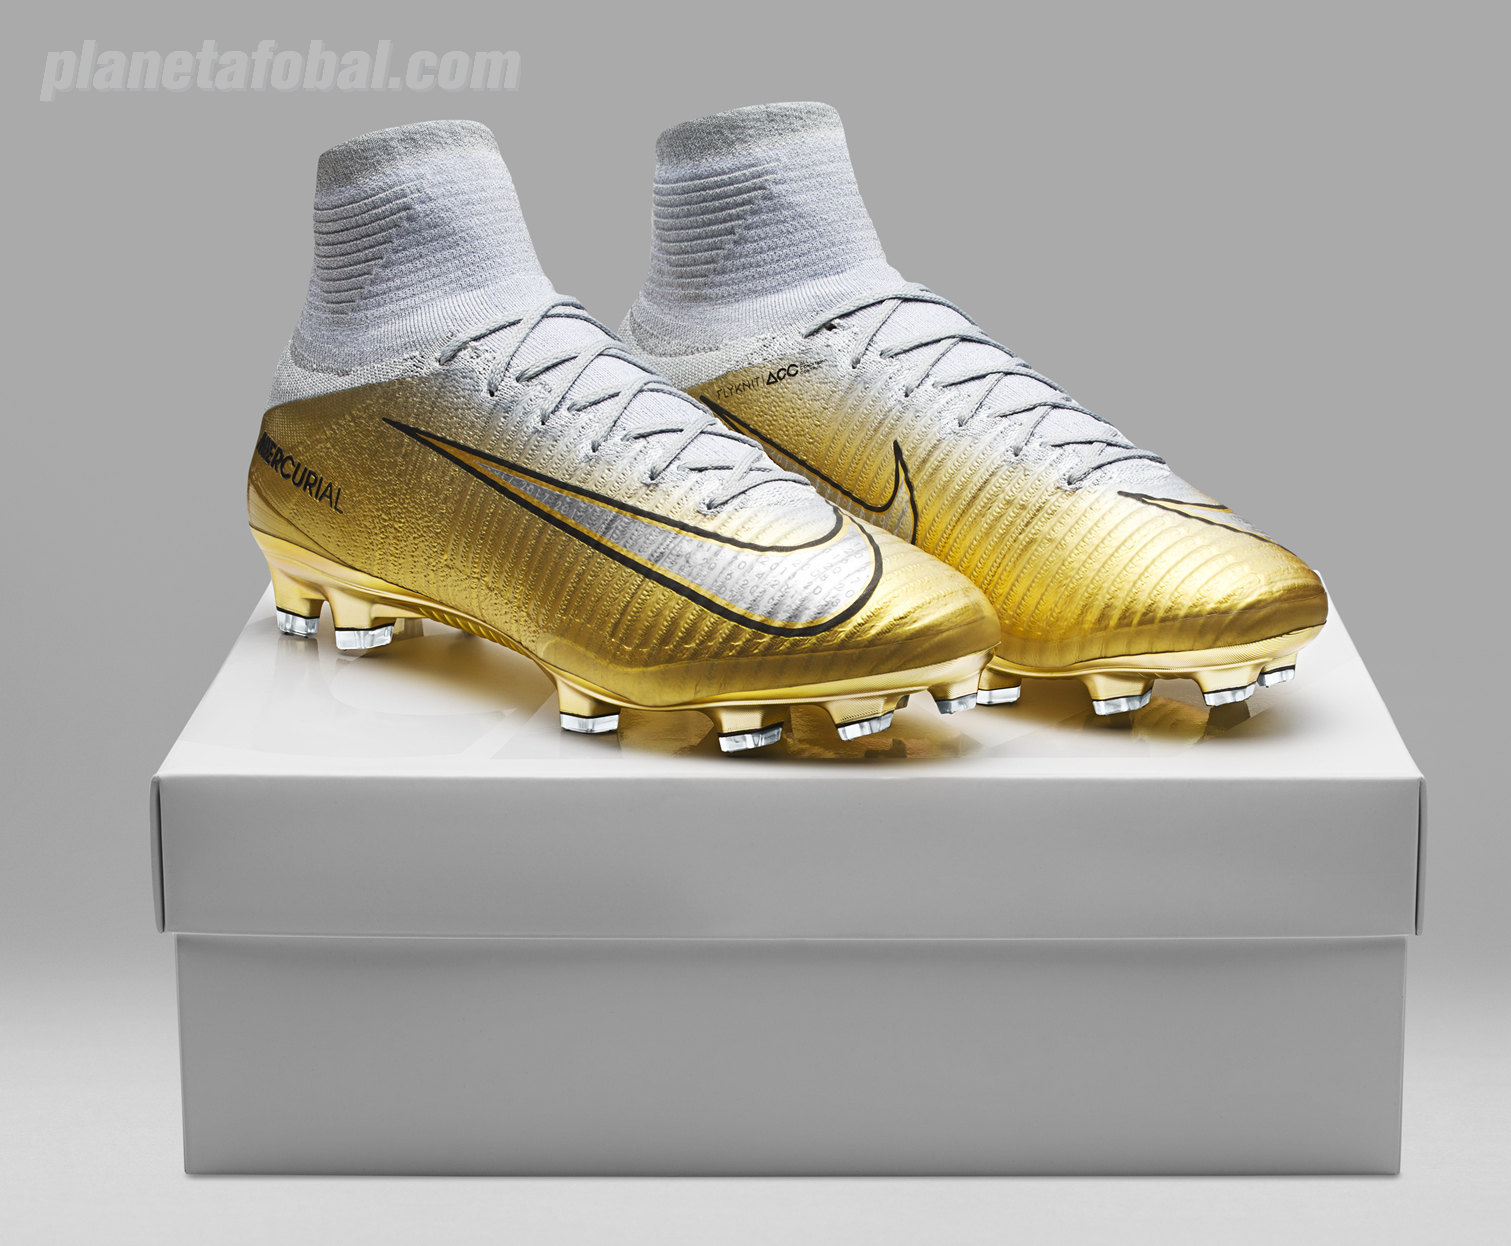 Botines especiales Quinto Triunfo de CR7 | Foto Nike